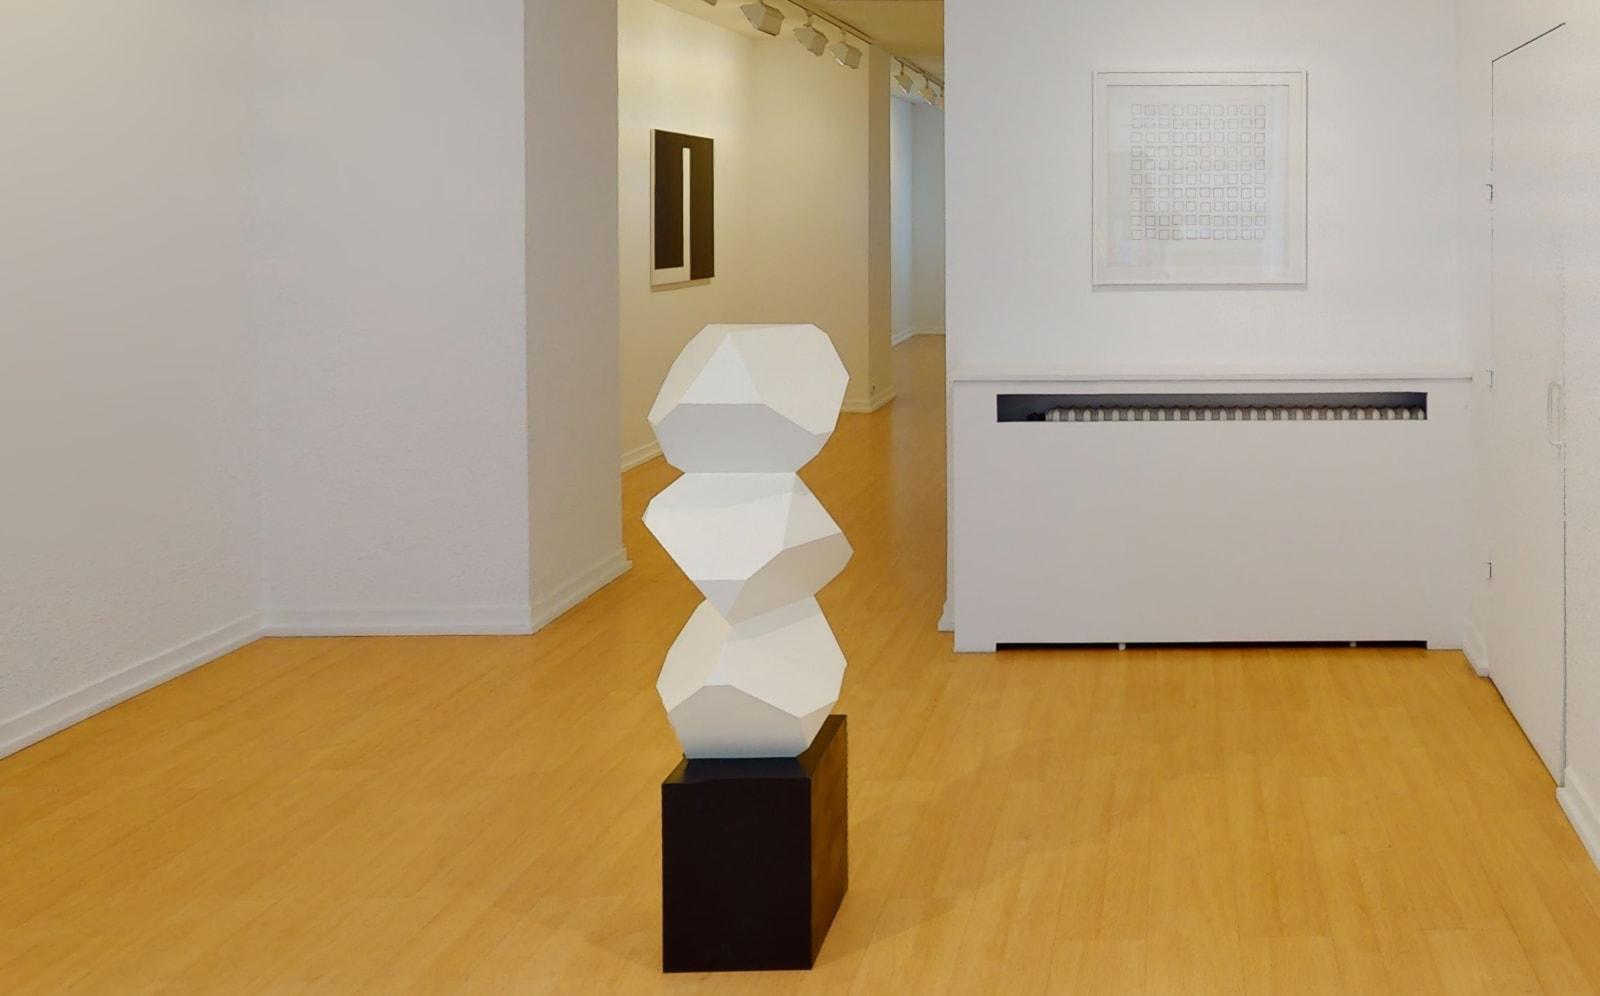 Exposition anniversaire ONIRIS 35 ANS / Norman Dilworth + Julije Knifer + Vera Molnar / Oniris été 2021